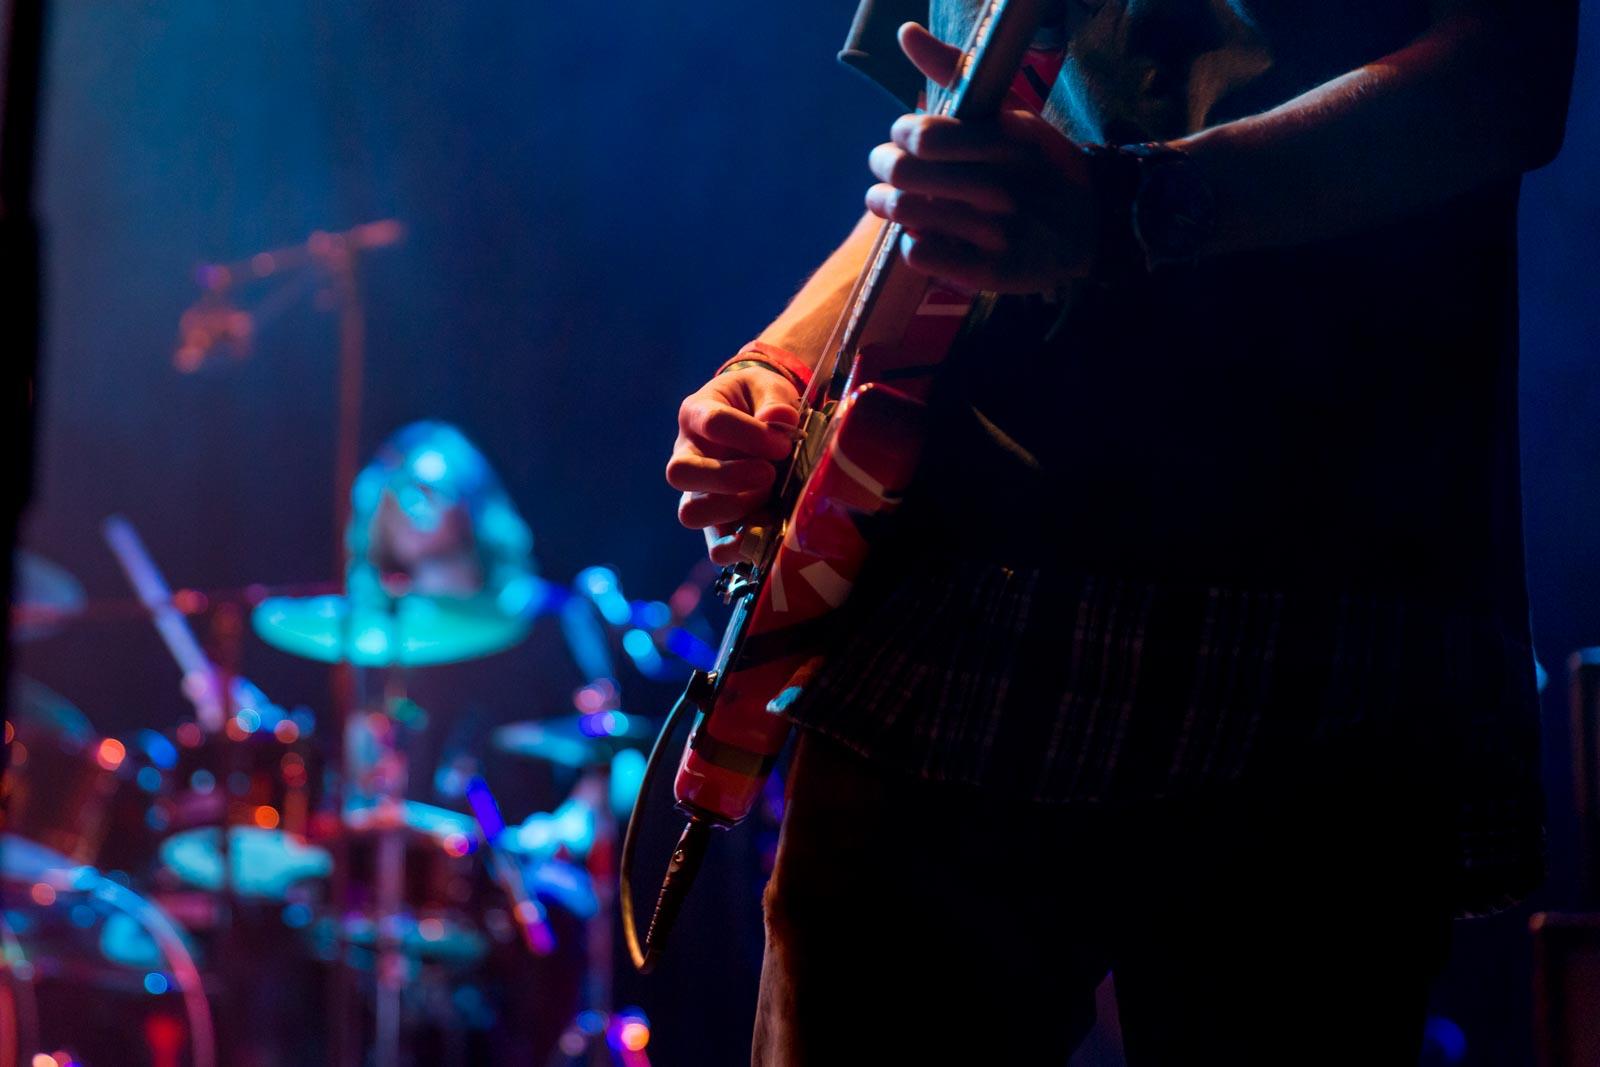 Scherpe gitarist en onscherpe drummer